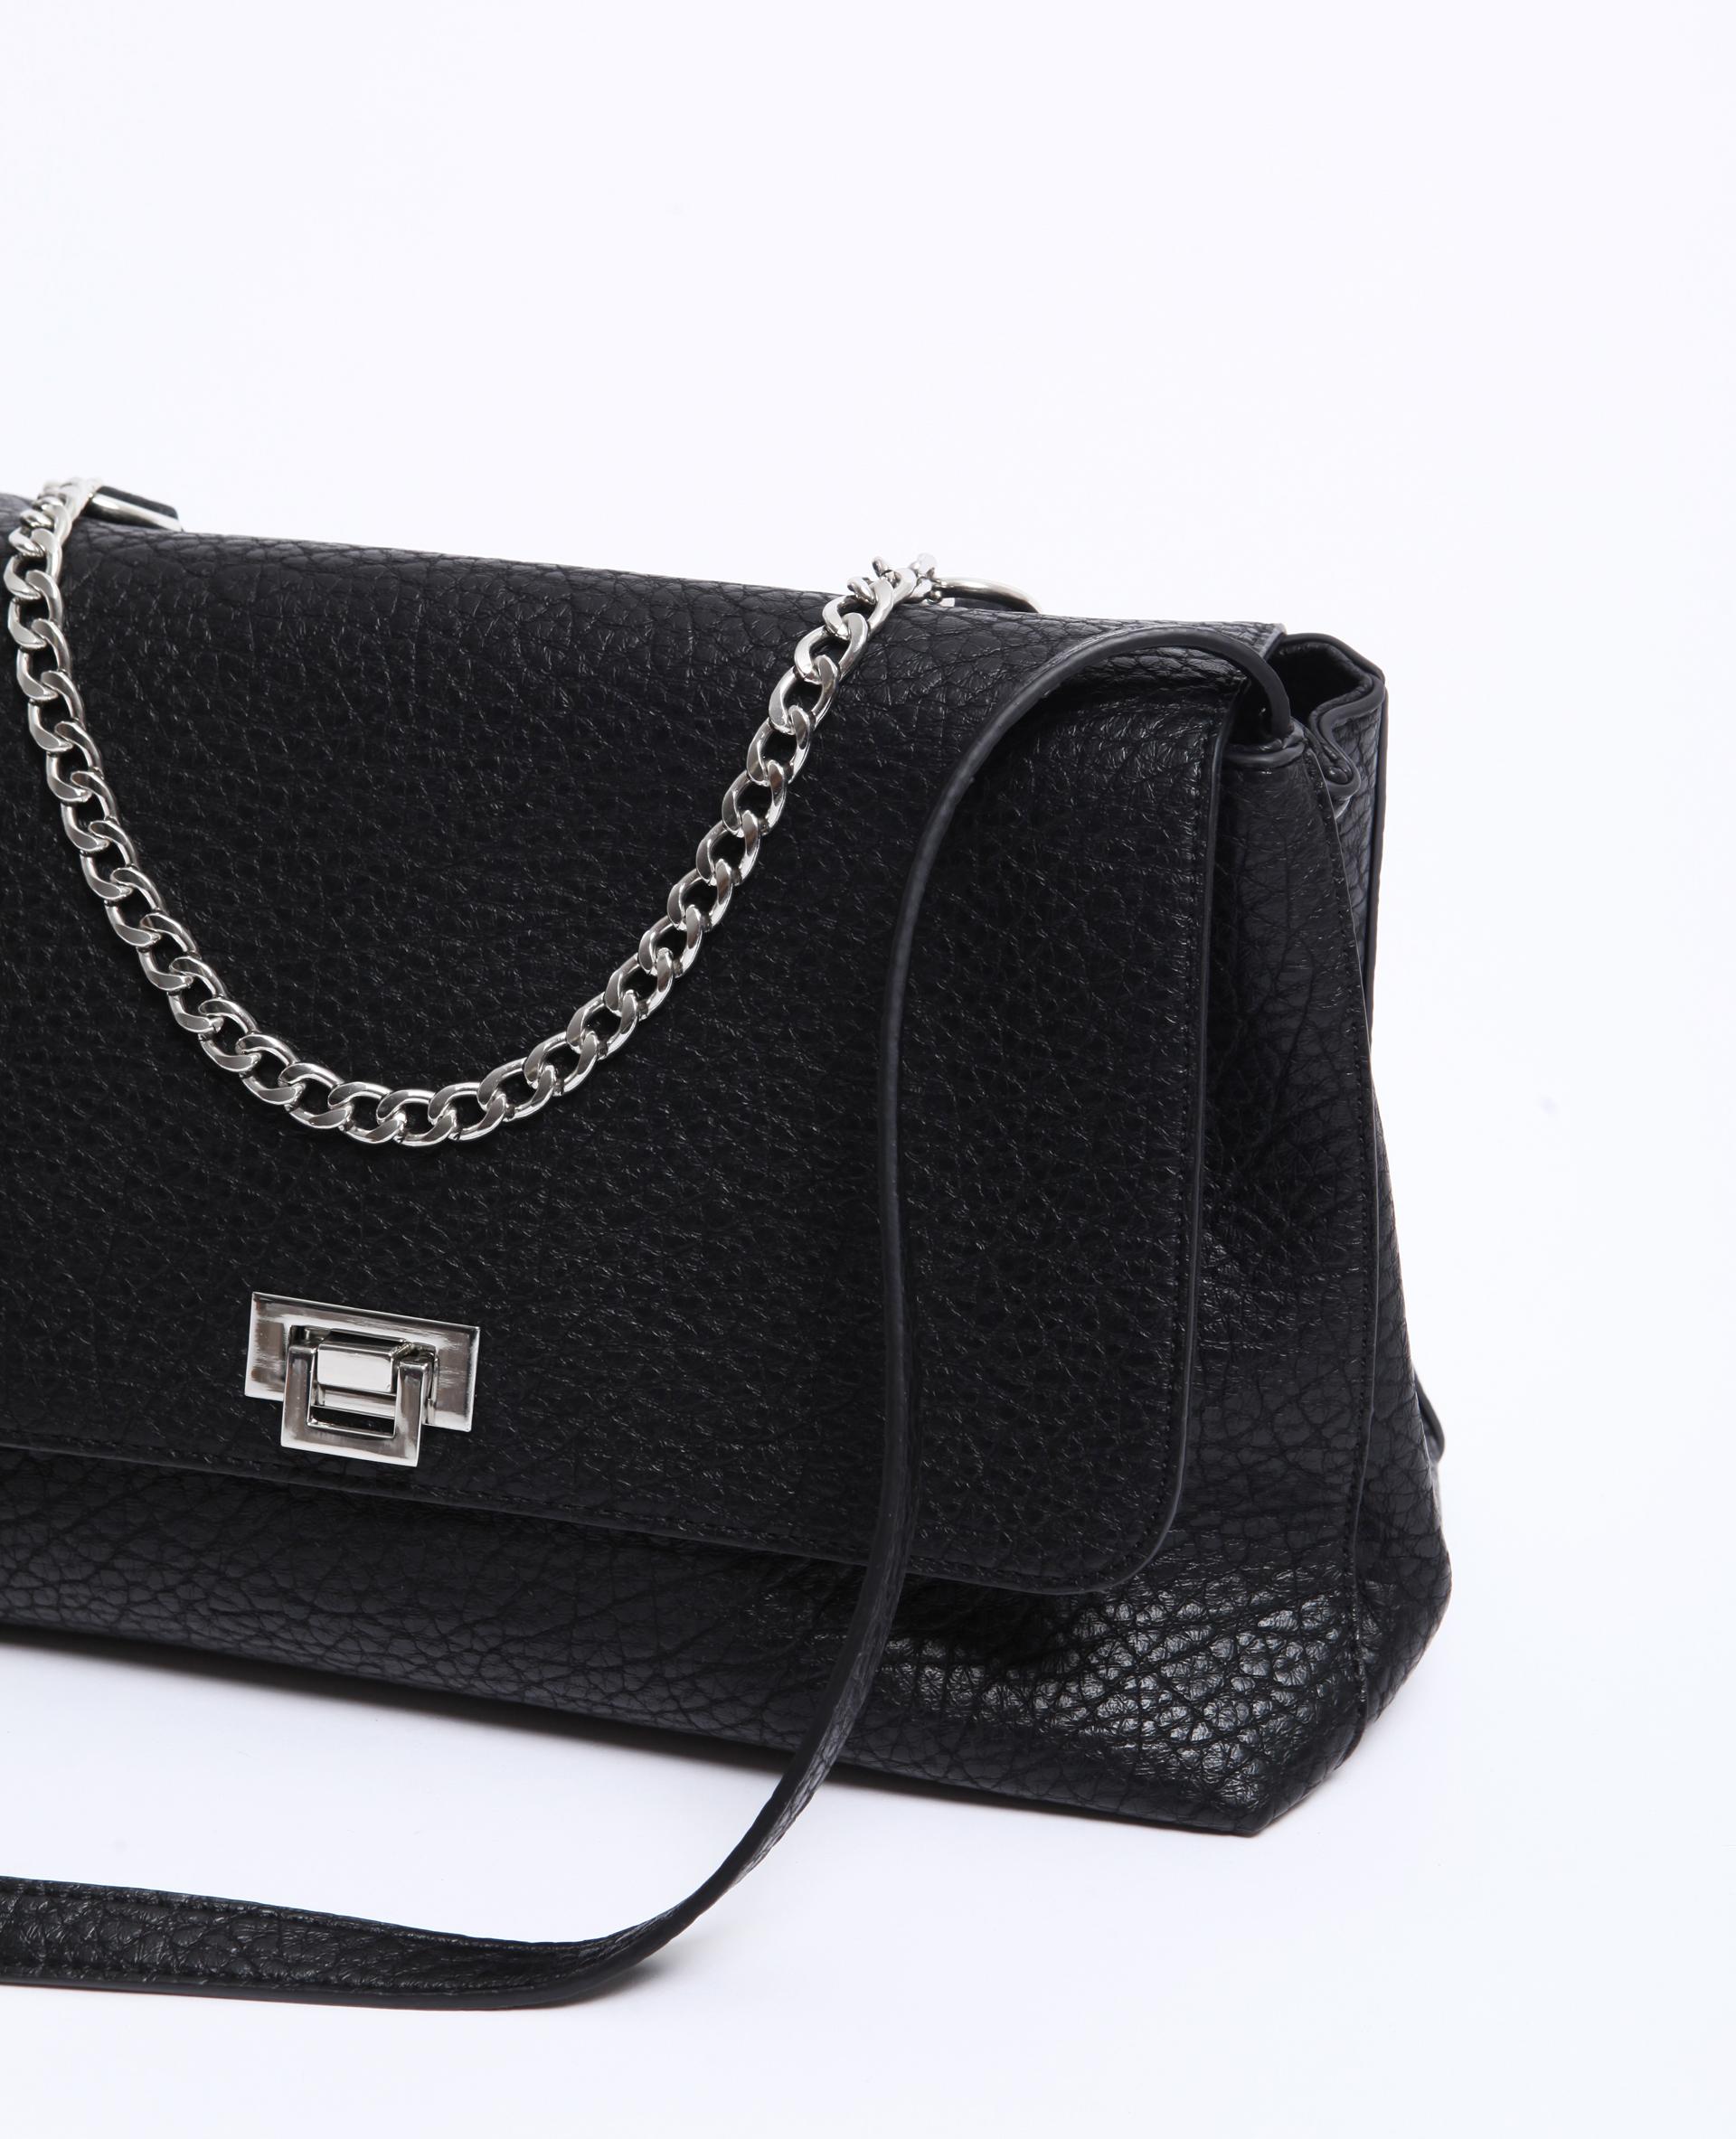 Grand sac en simili cuir noir - Pimkie